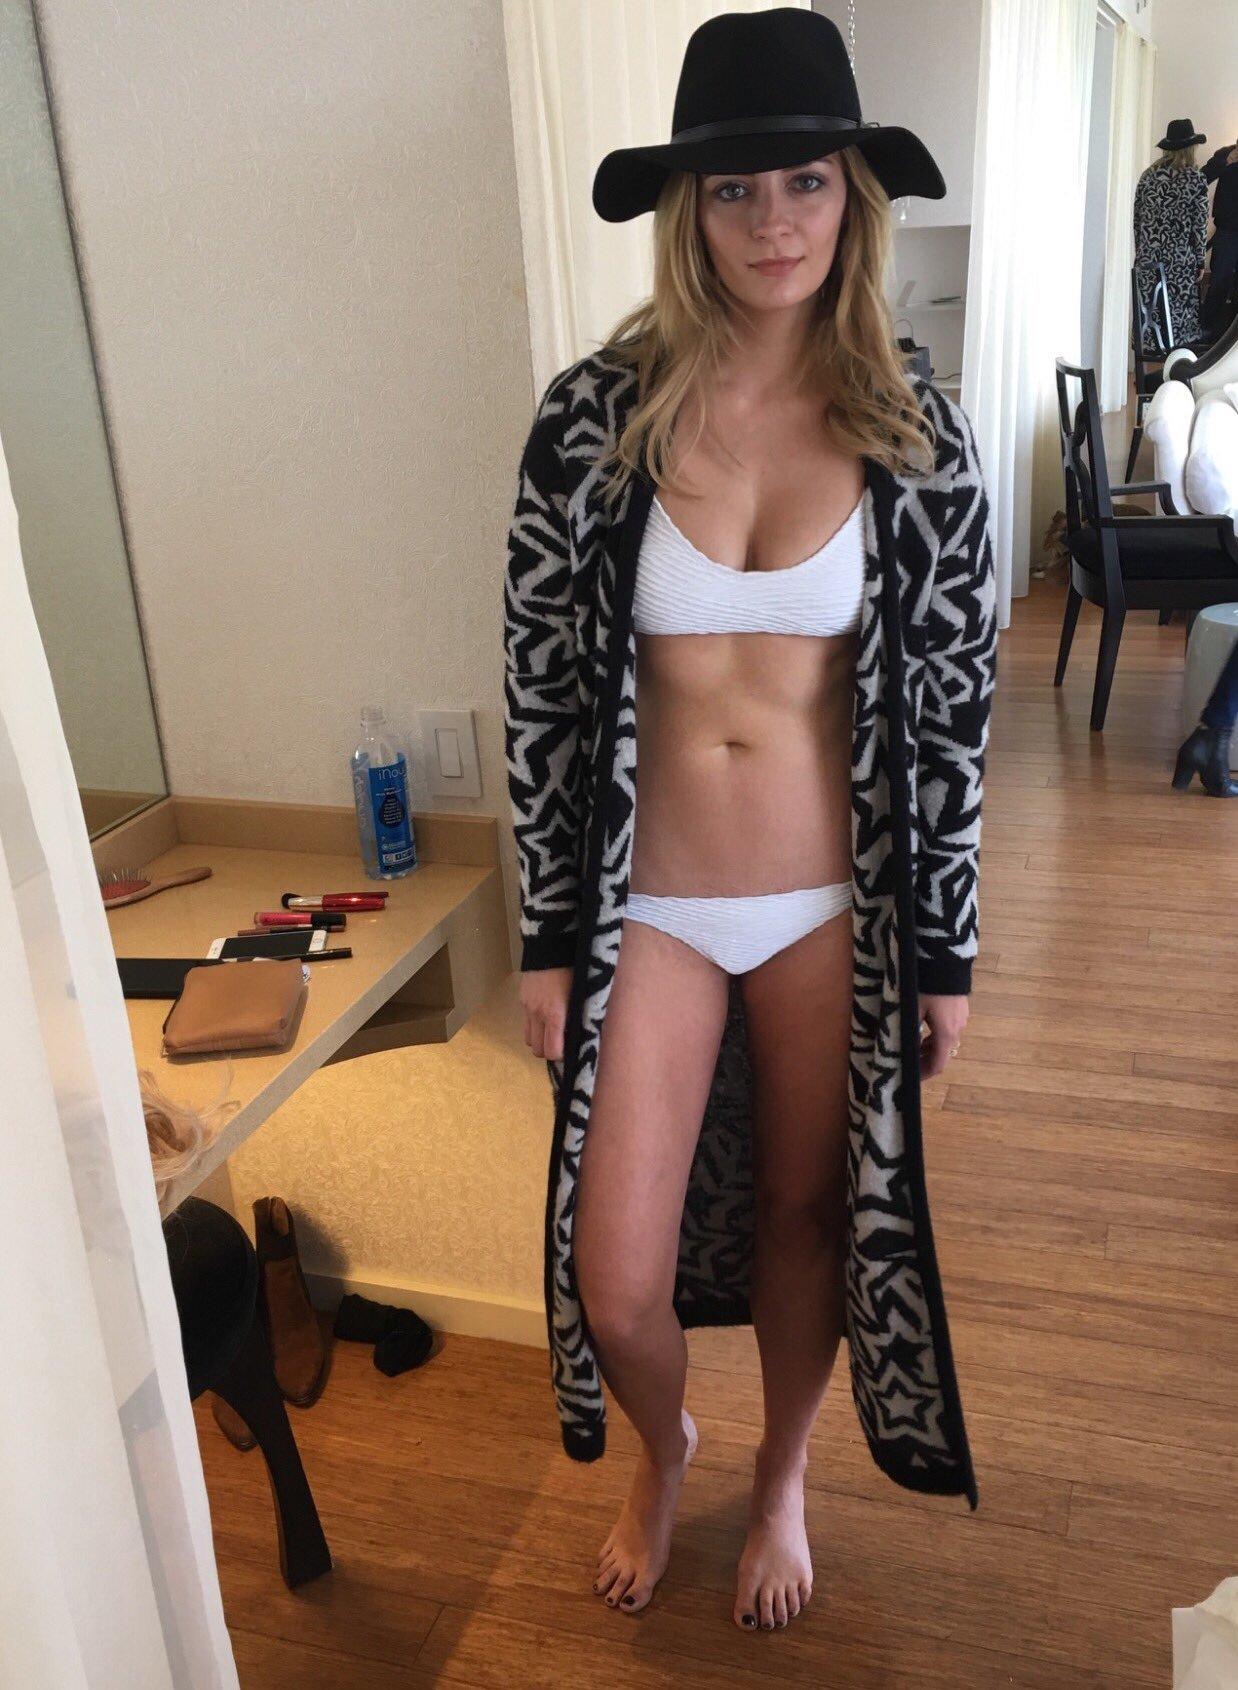 Young Ass Mischa Barton  naked (16 fotos), Instagram, underwear